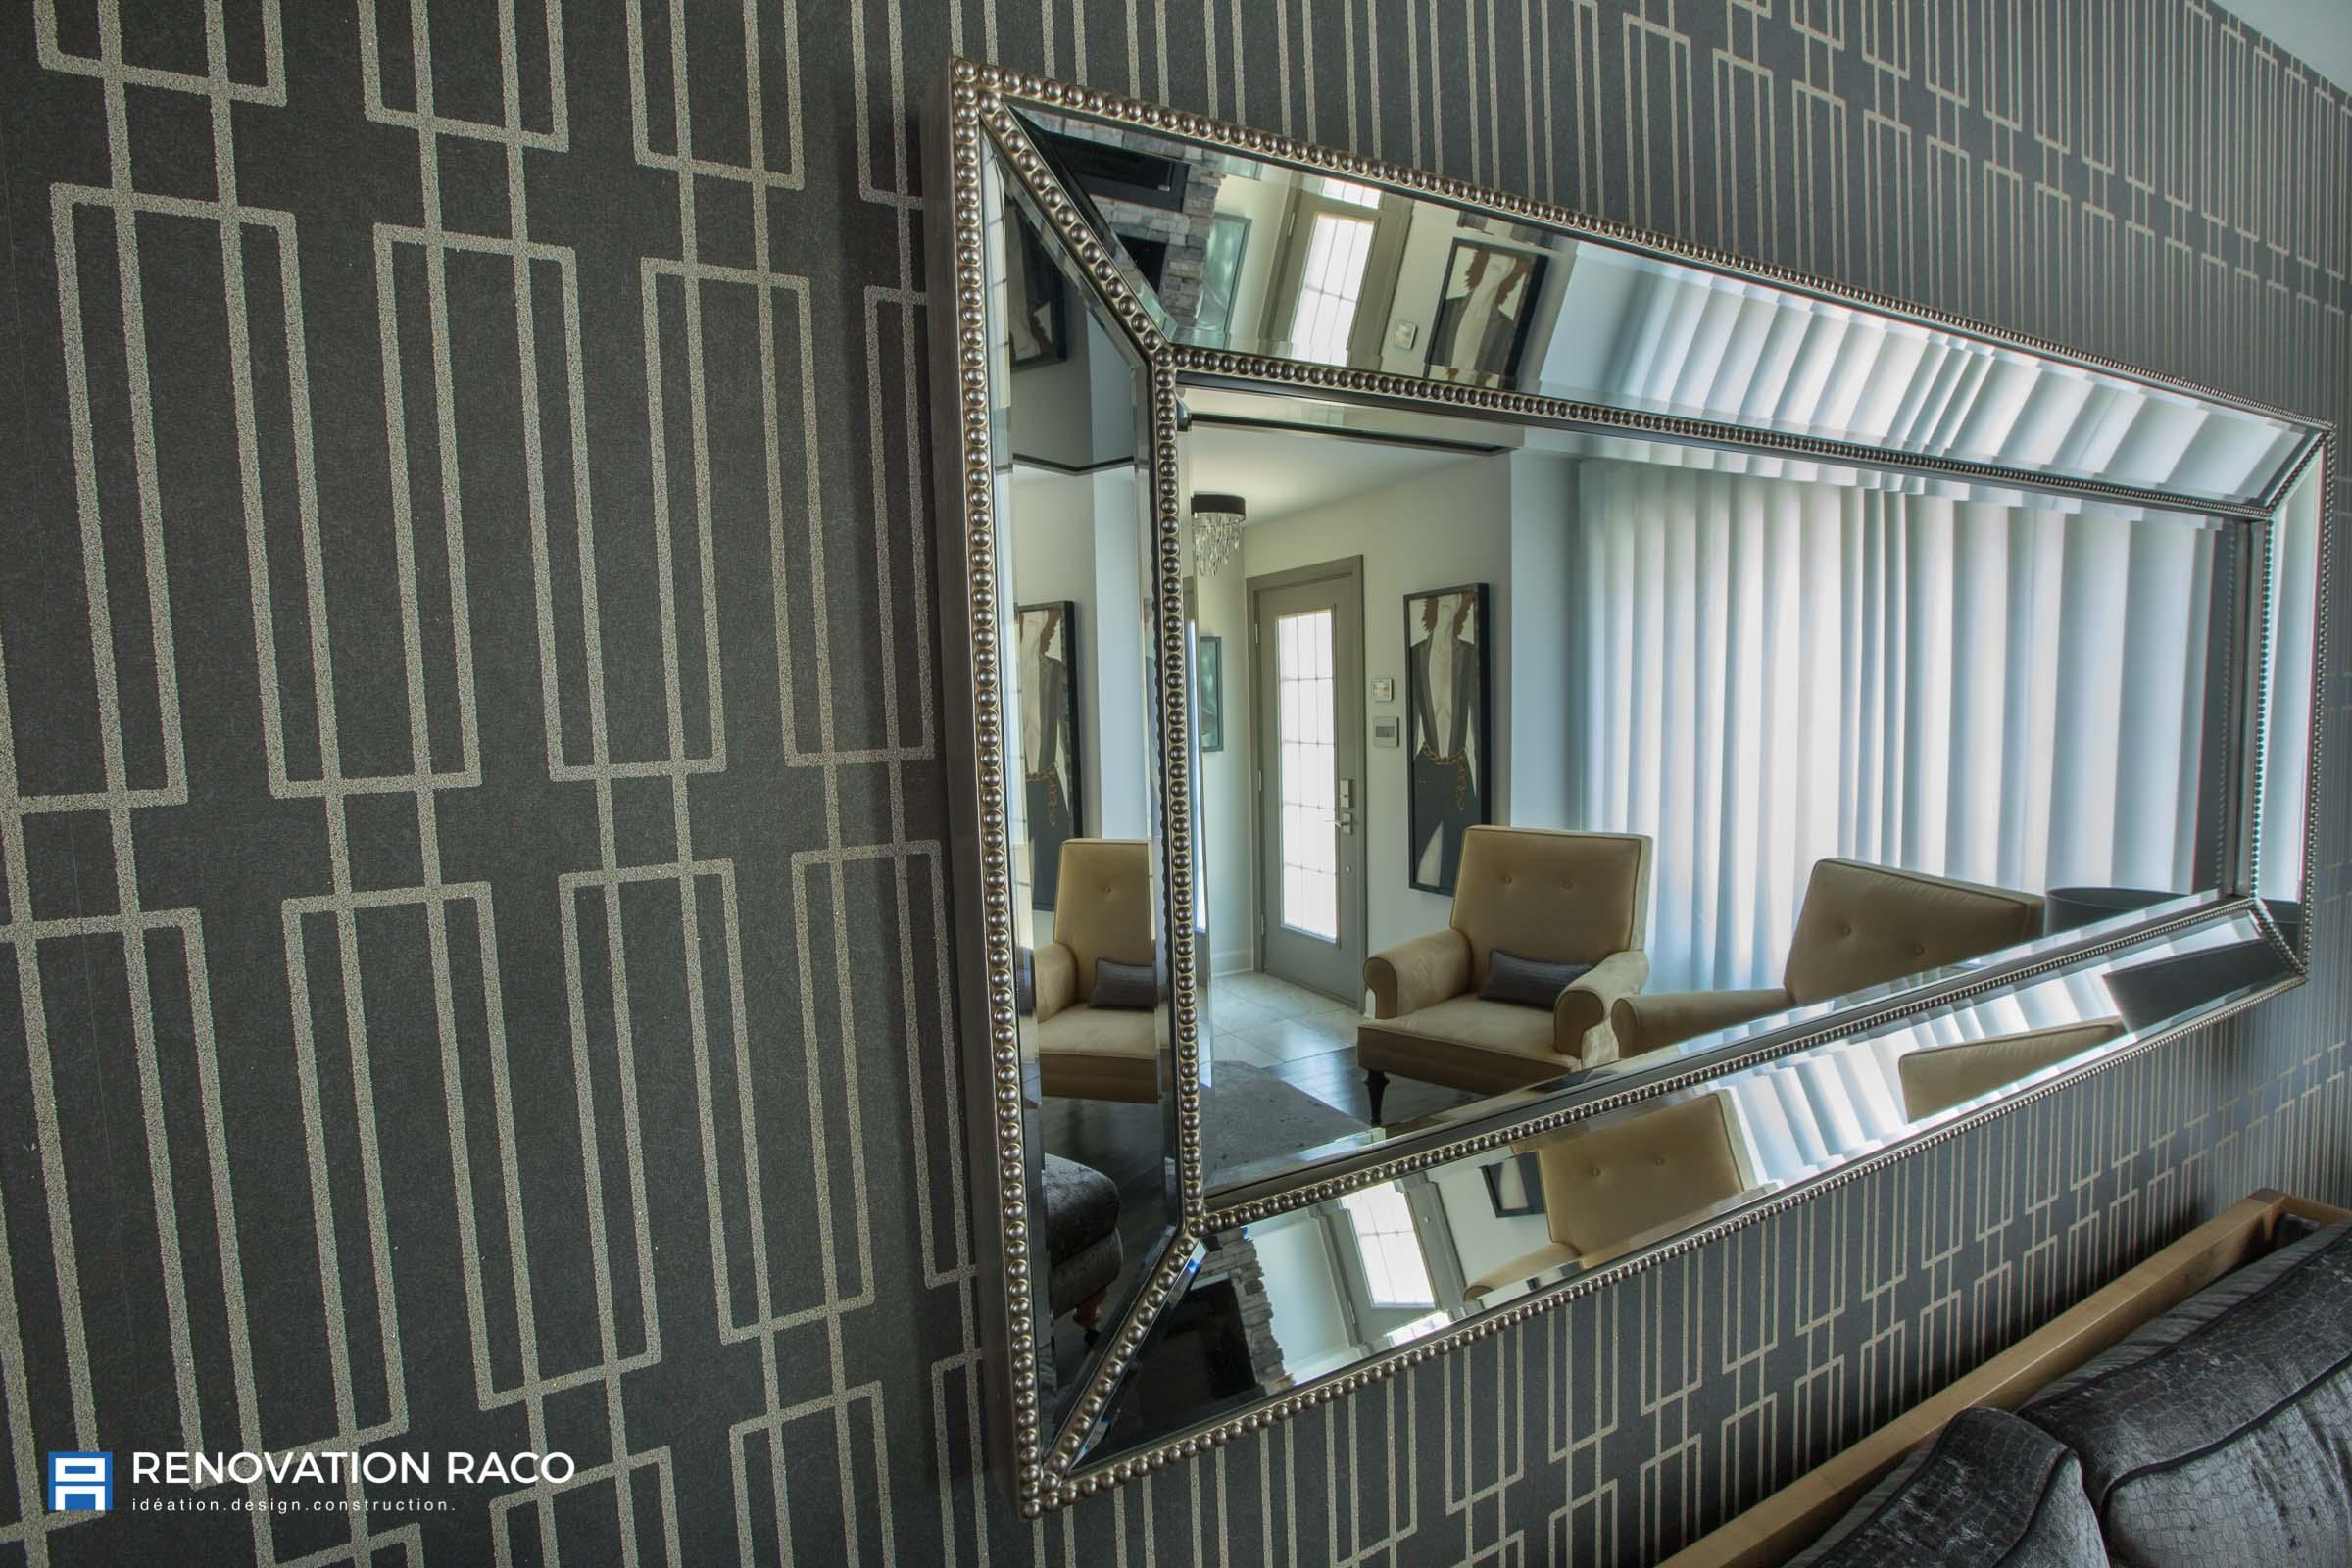 Renovation-desing-interieur-montreal-04.jpg